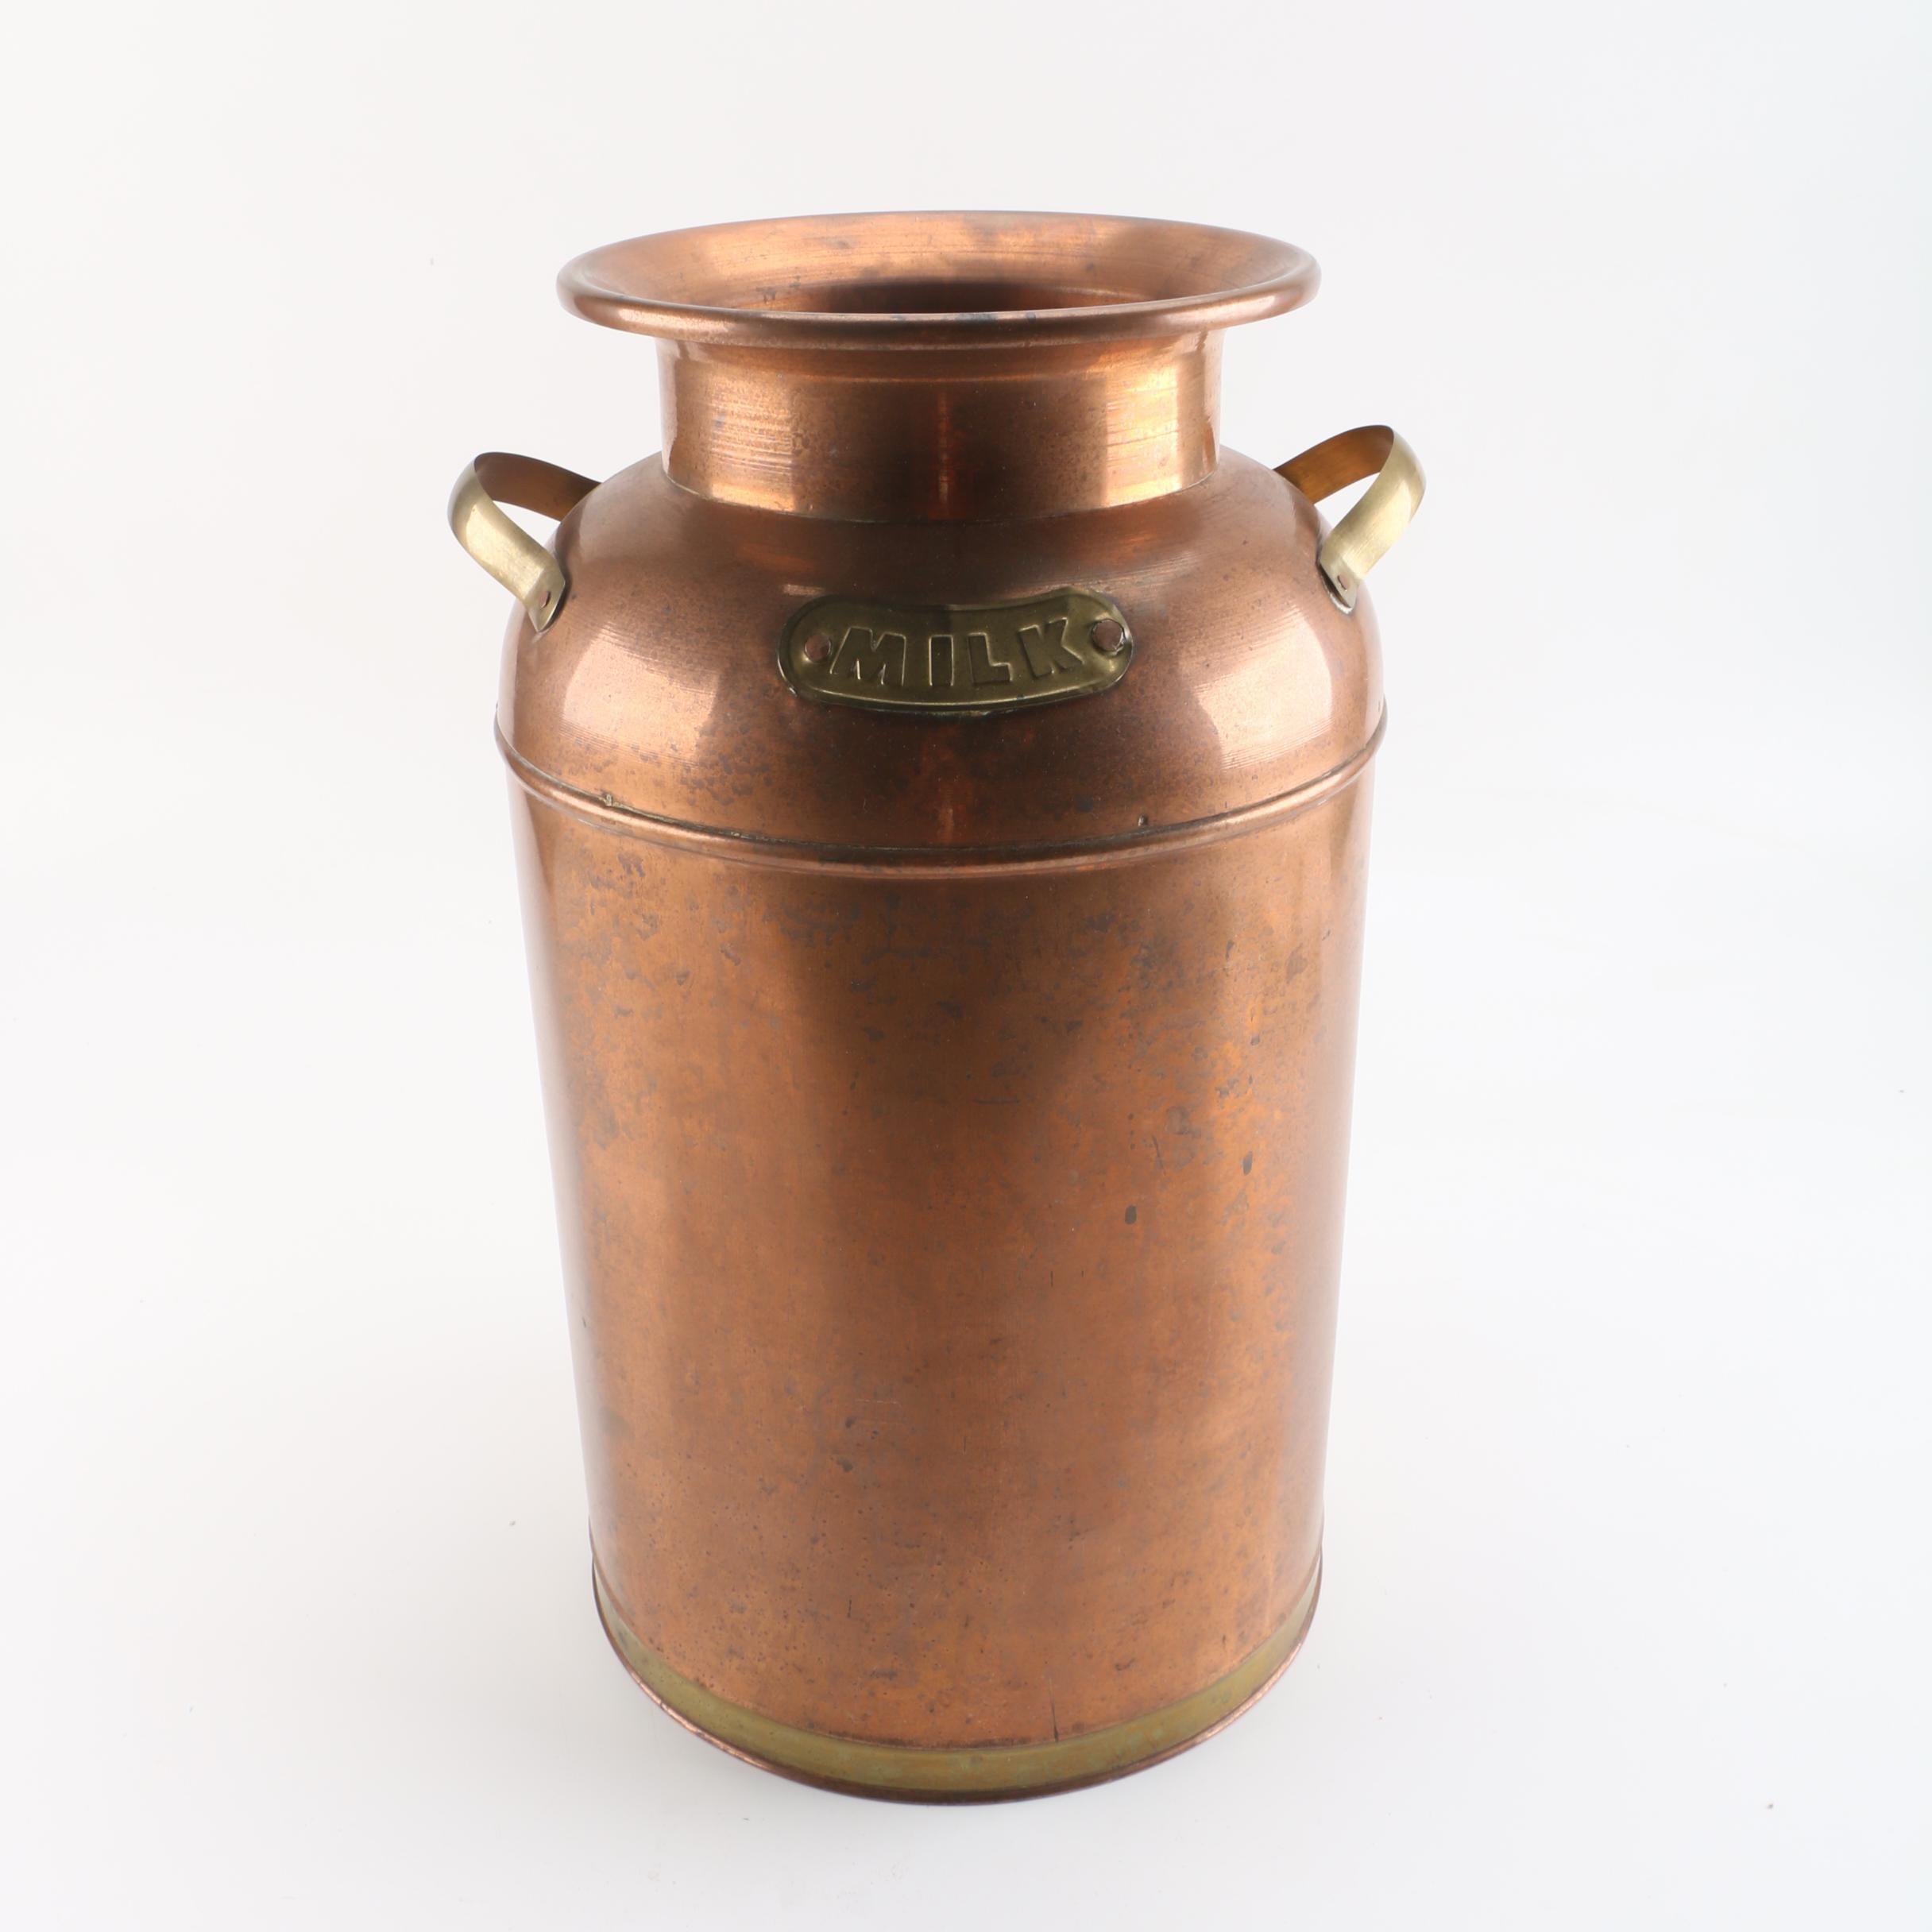 Decorative Copper Clad Milk Can